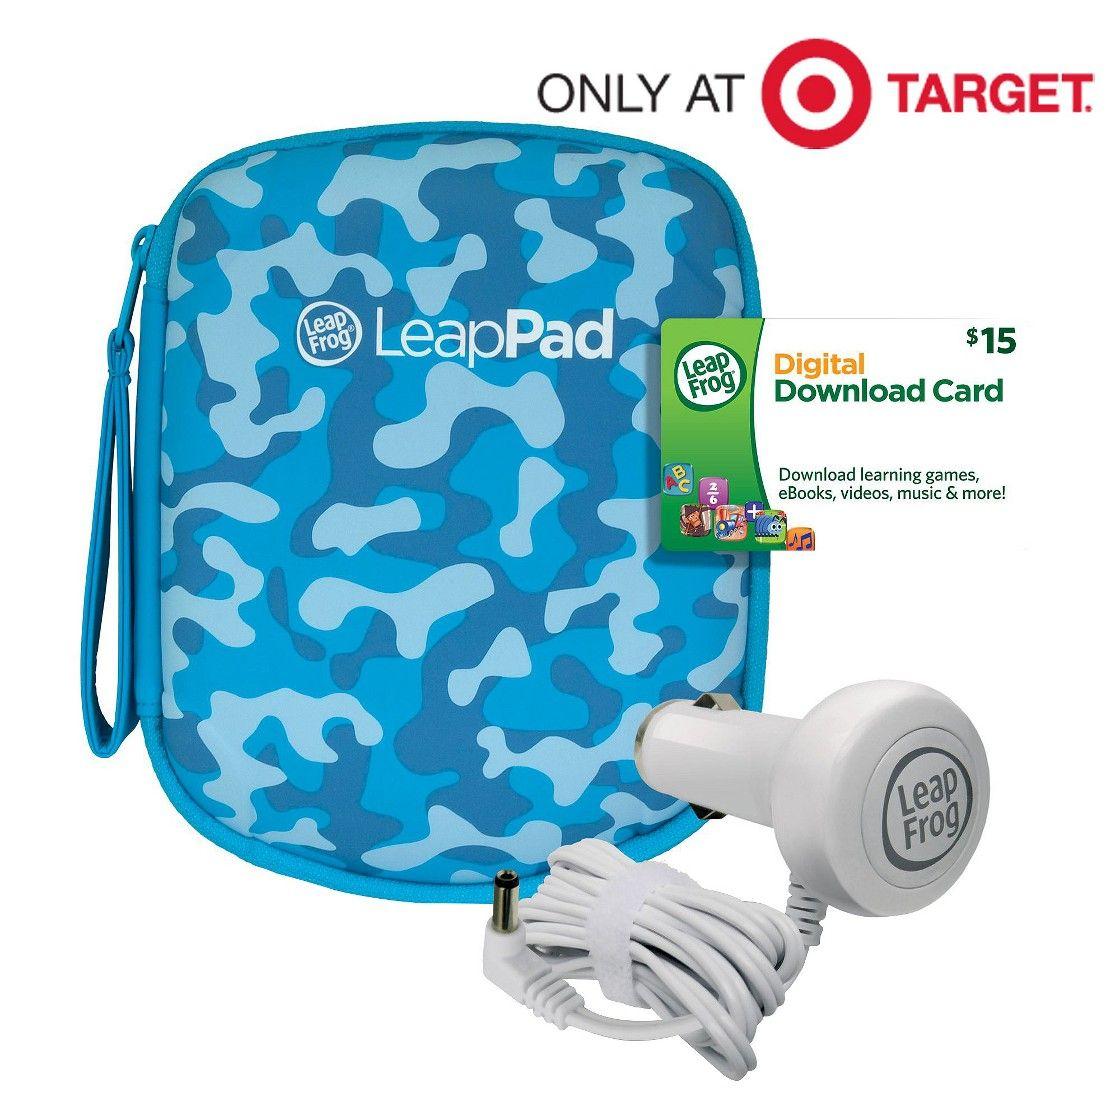 Leapfrog Leappad On The Go Accessories Bun Target